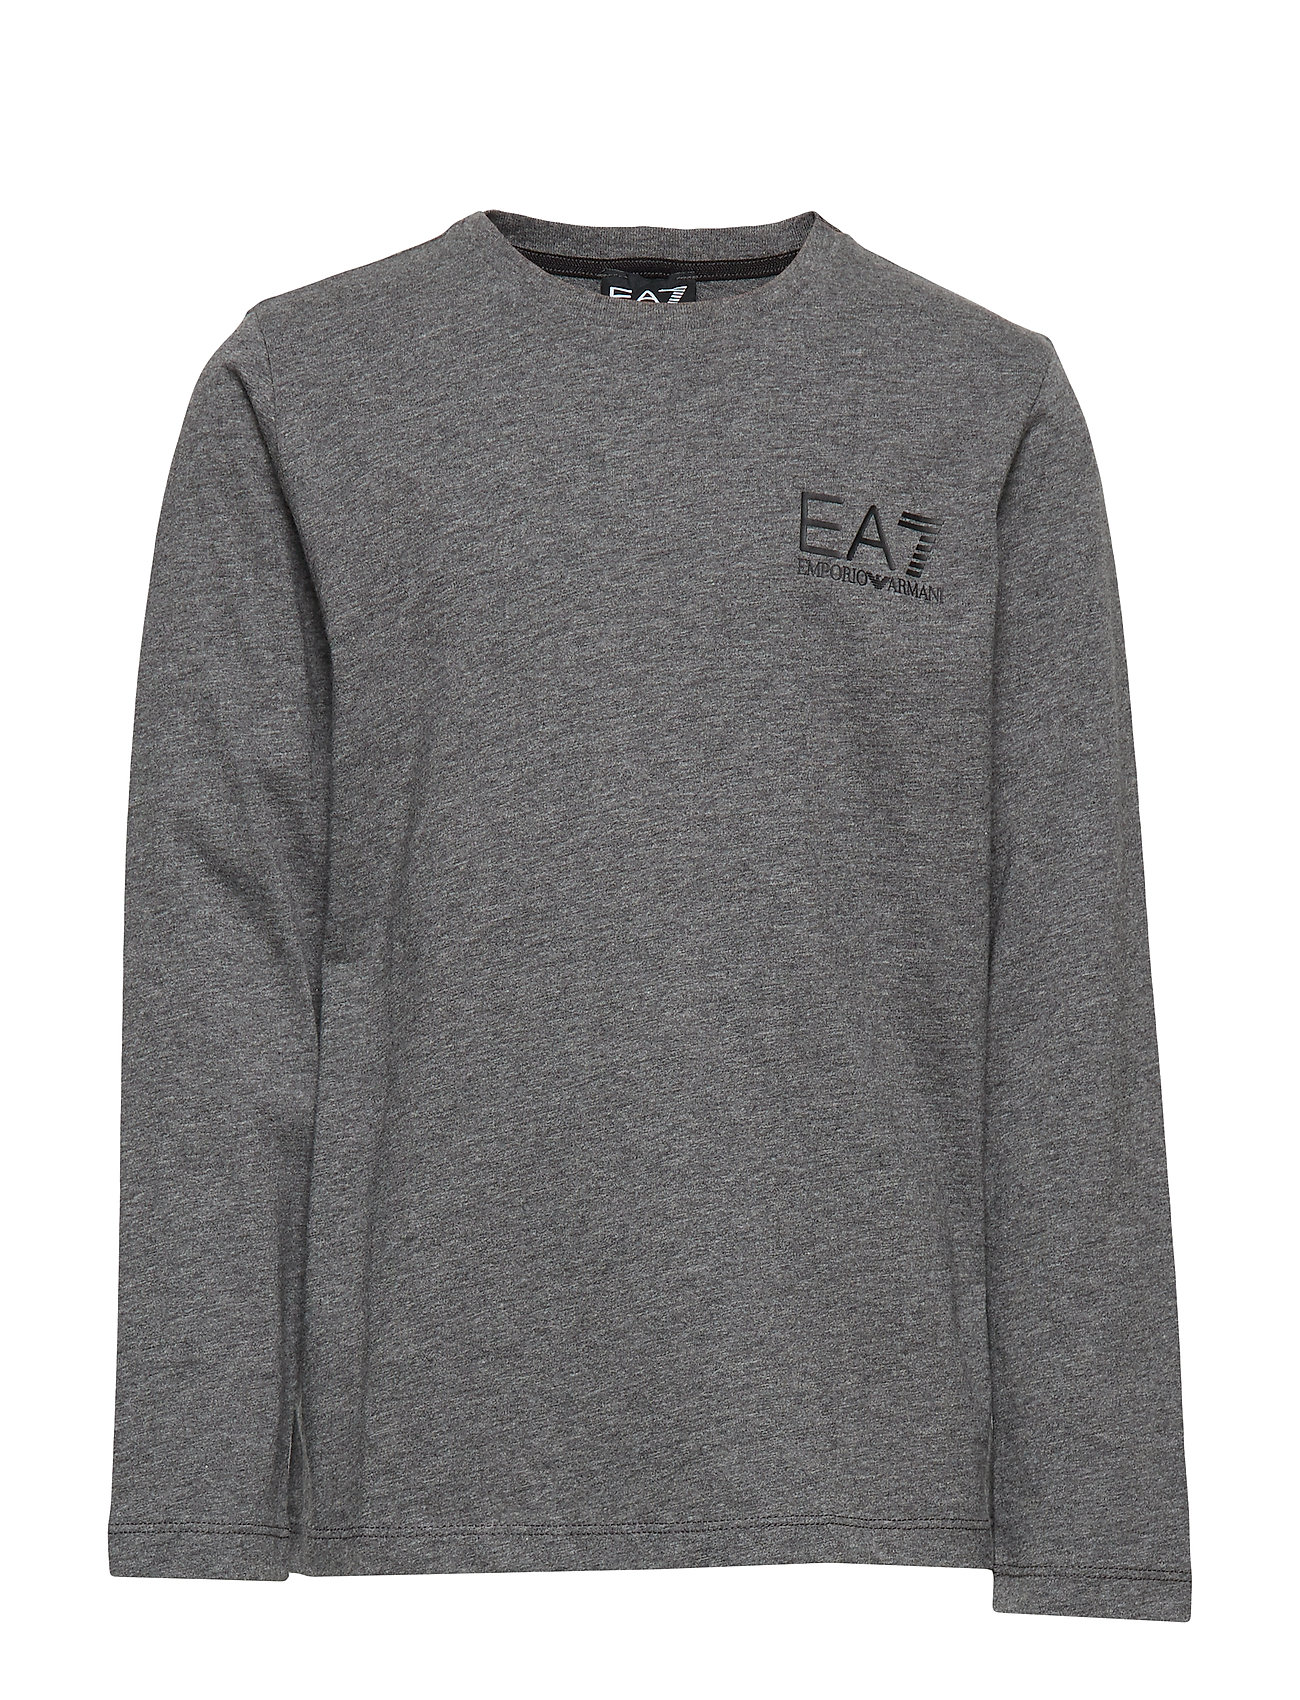 Image of T-Shirt T-Langærmet Skjorte Grå EA7 (3204841365)